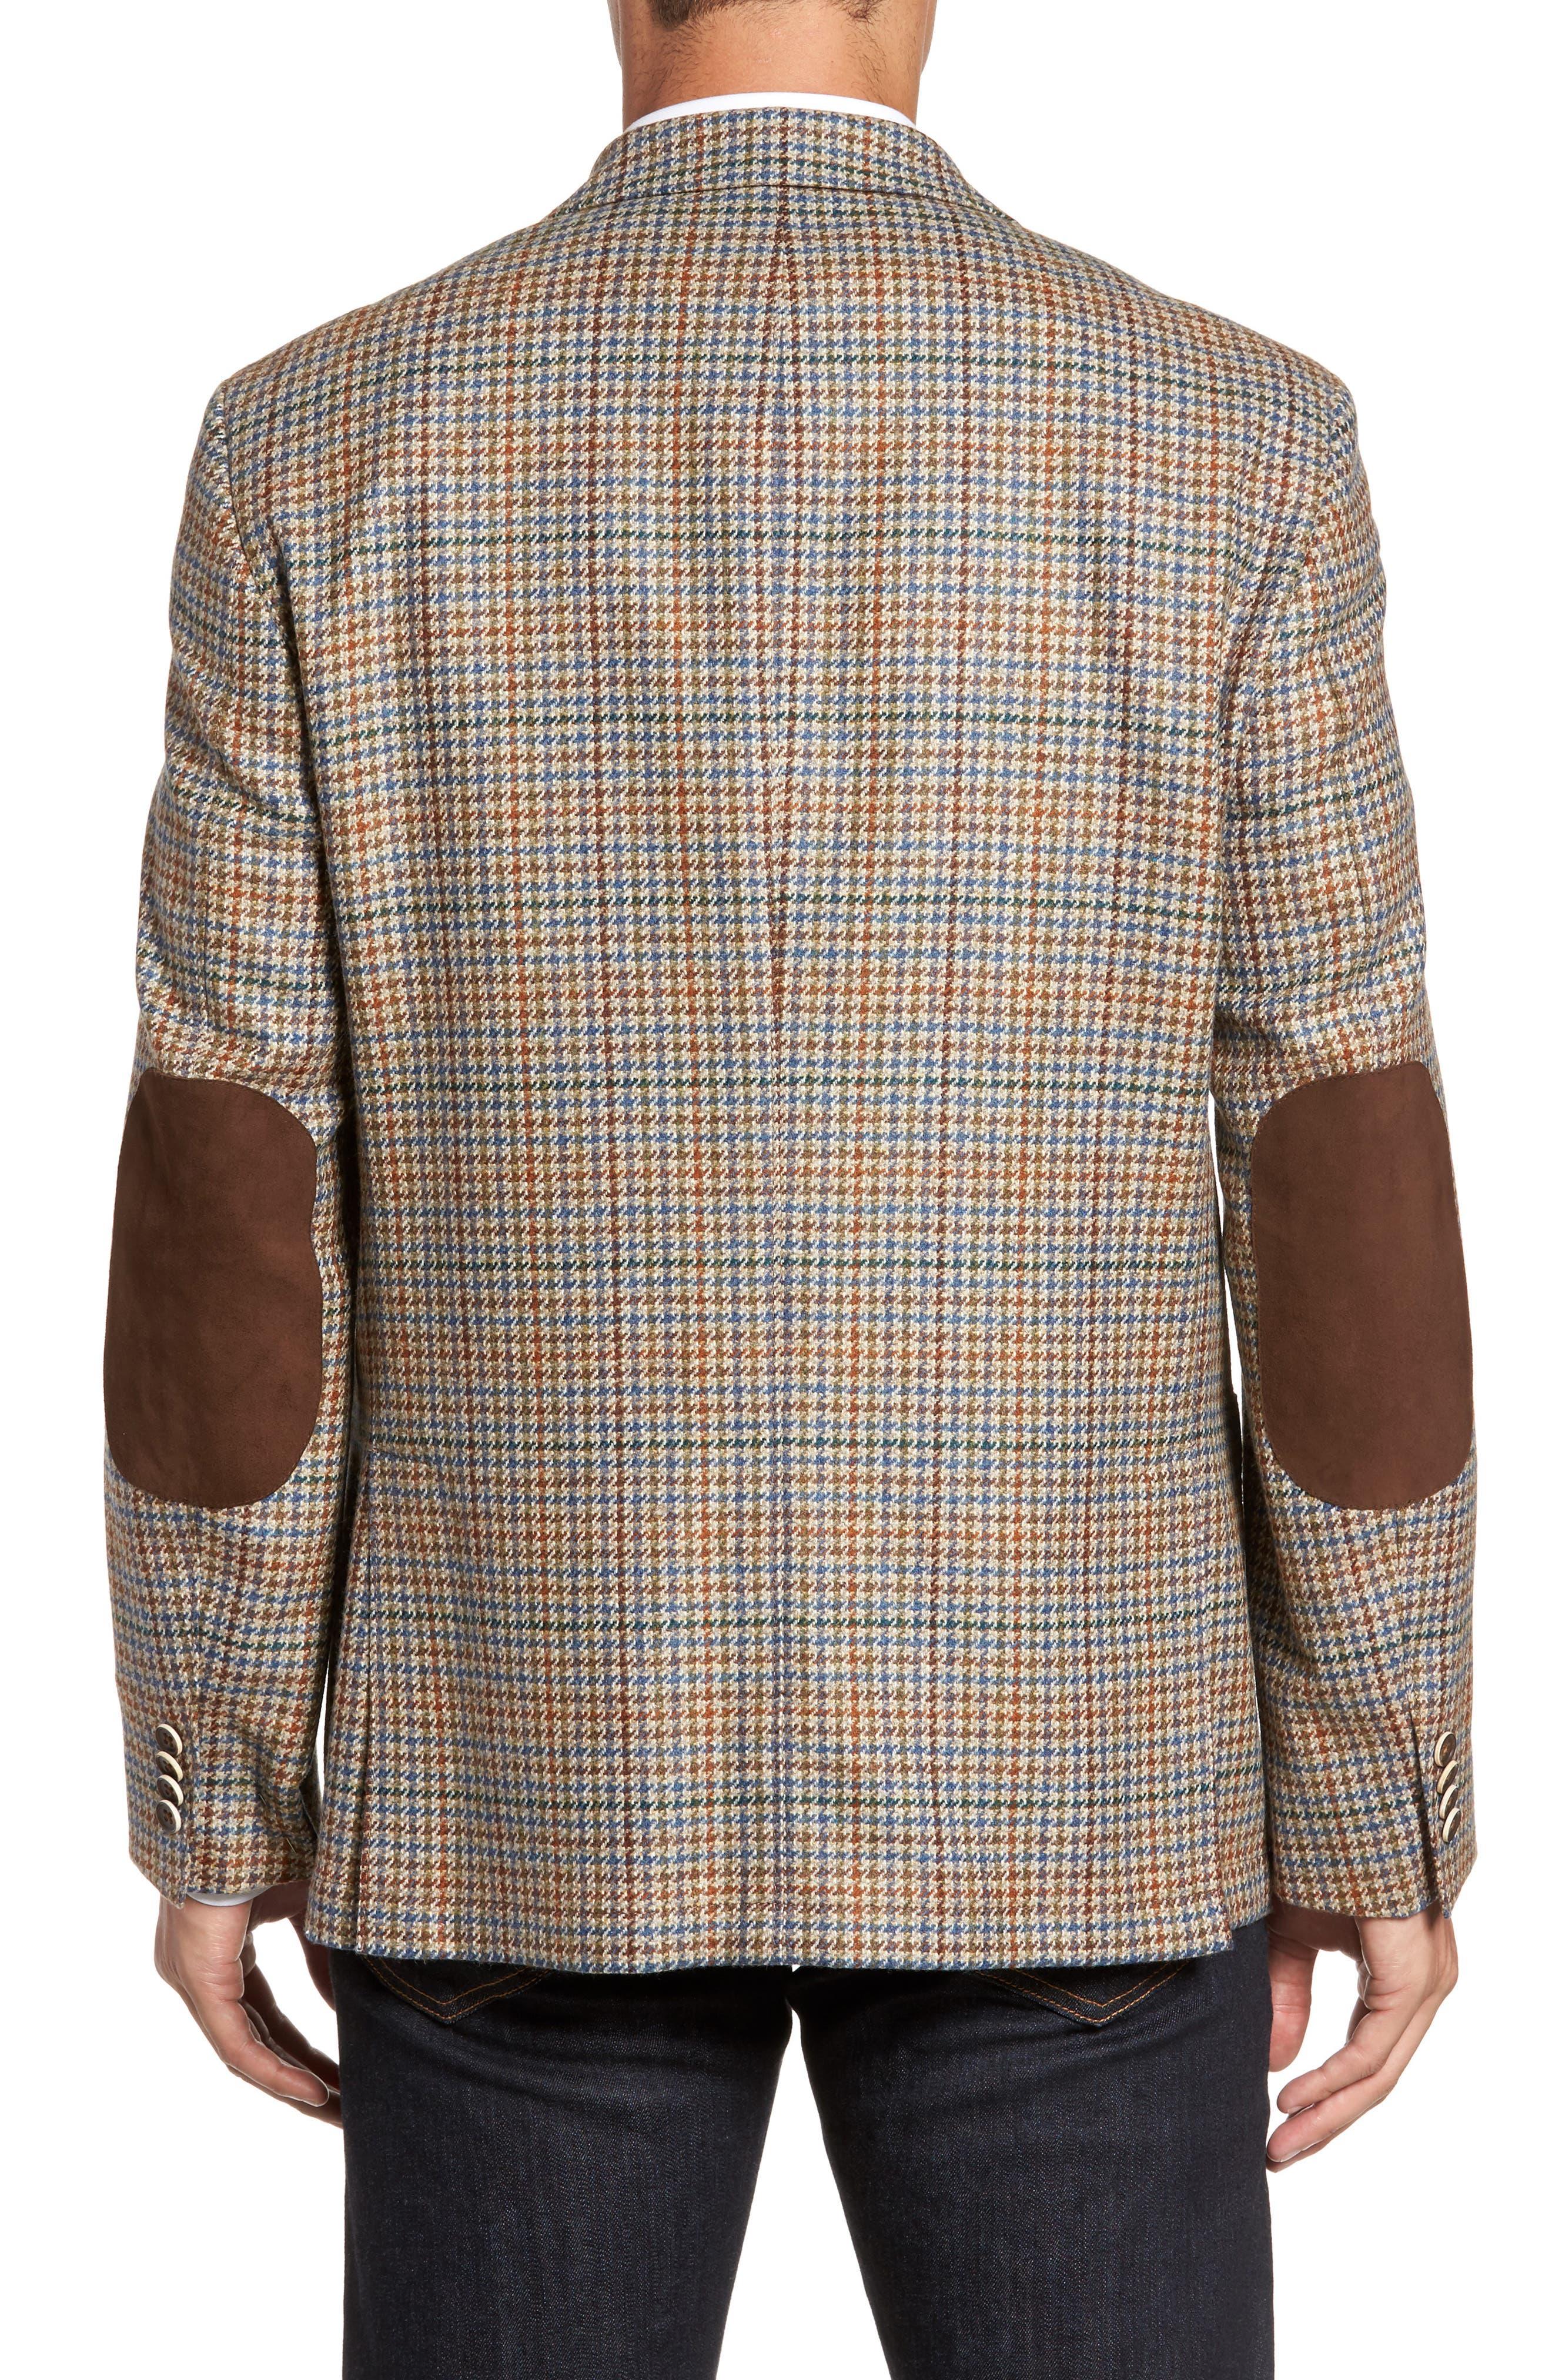 Houndstooth Wool Blend Sport Coat,                             Alternate thumbnail 2, color,                             250